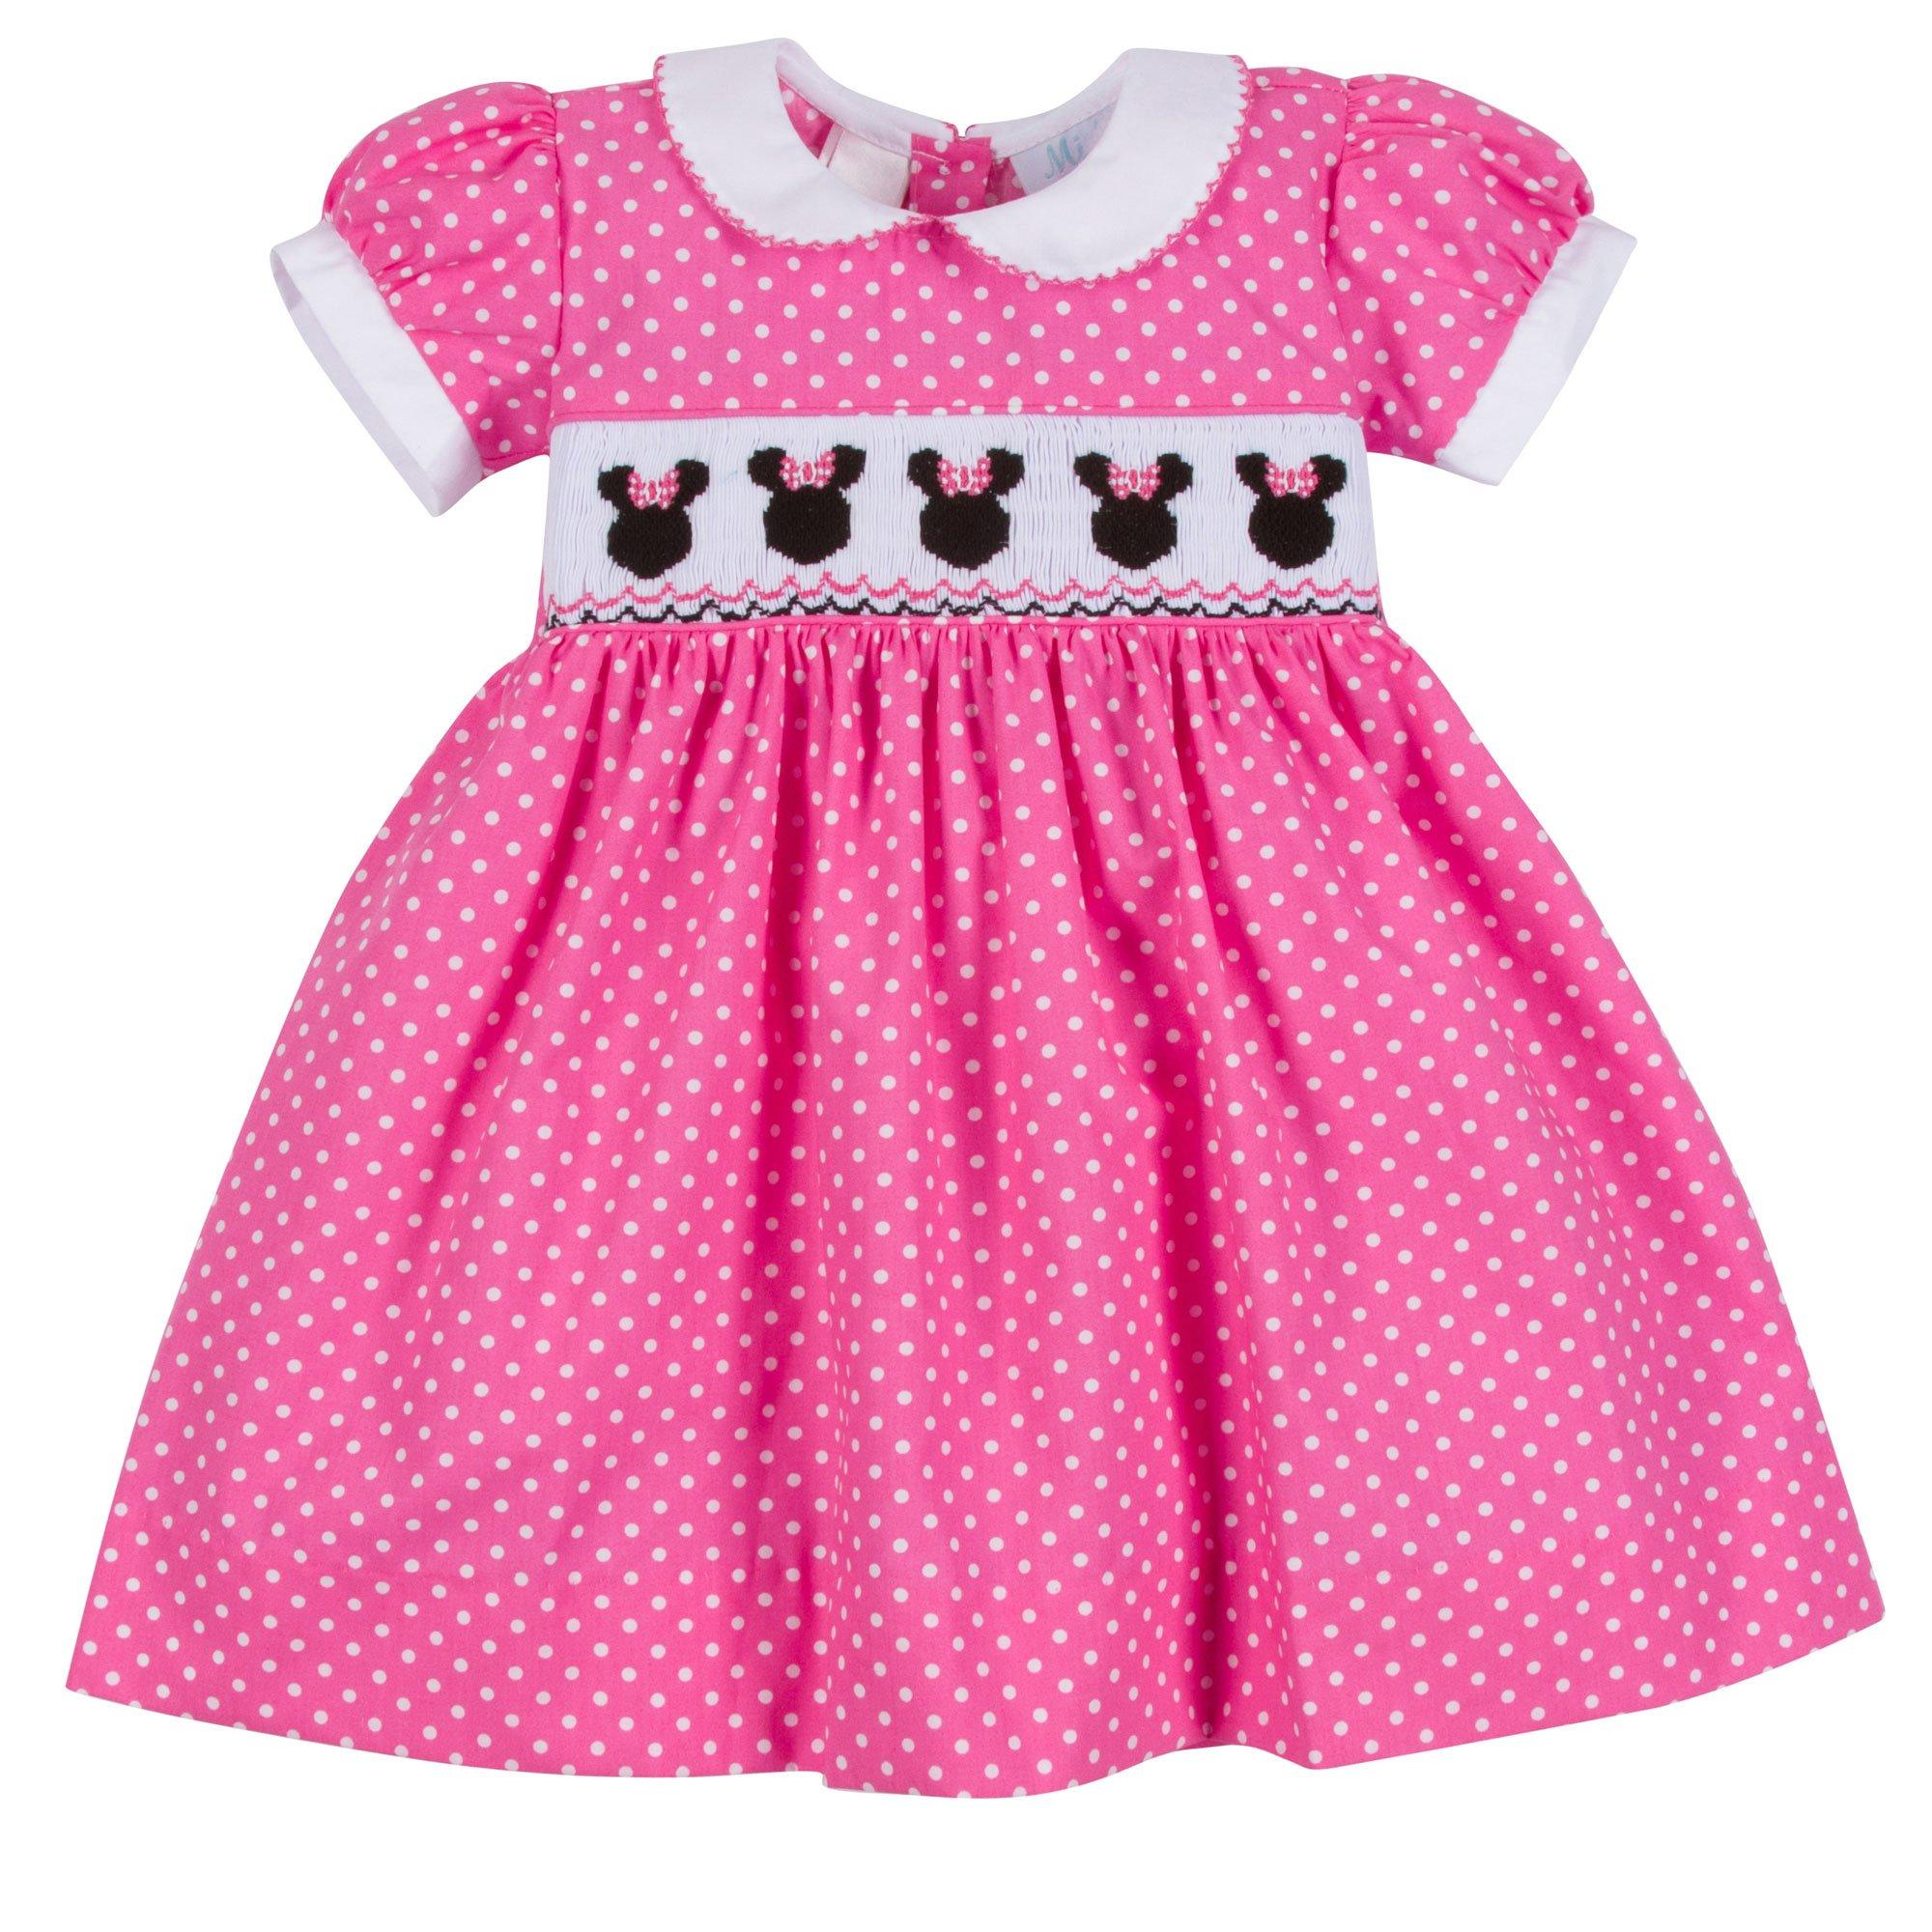 lulu b b minnie mouse dress in pink. Black Bedroom Furniture Sets. Home Design Ideas